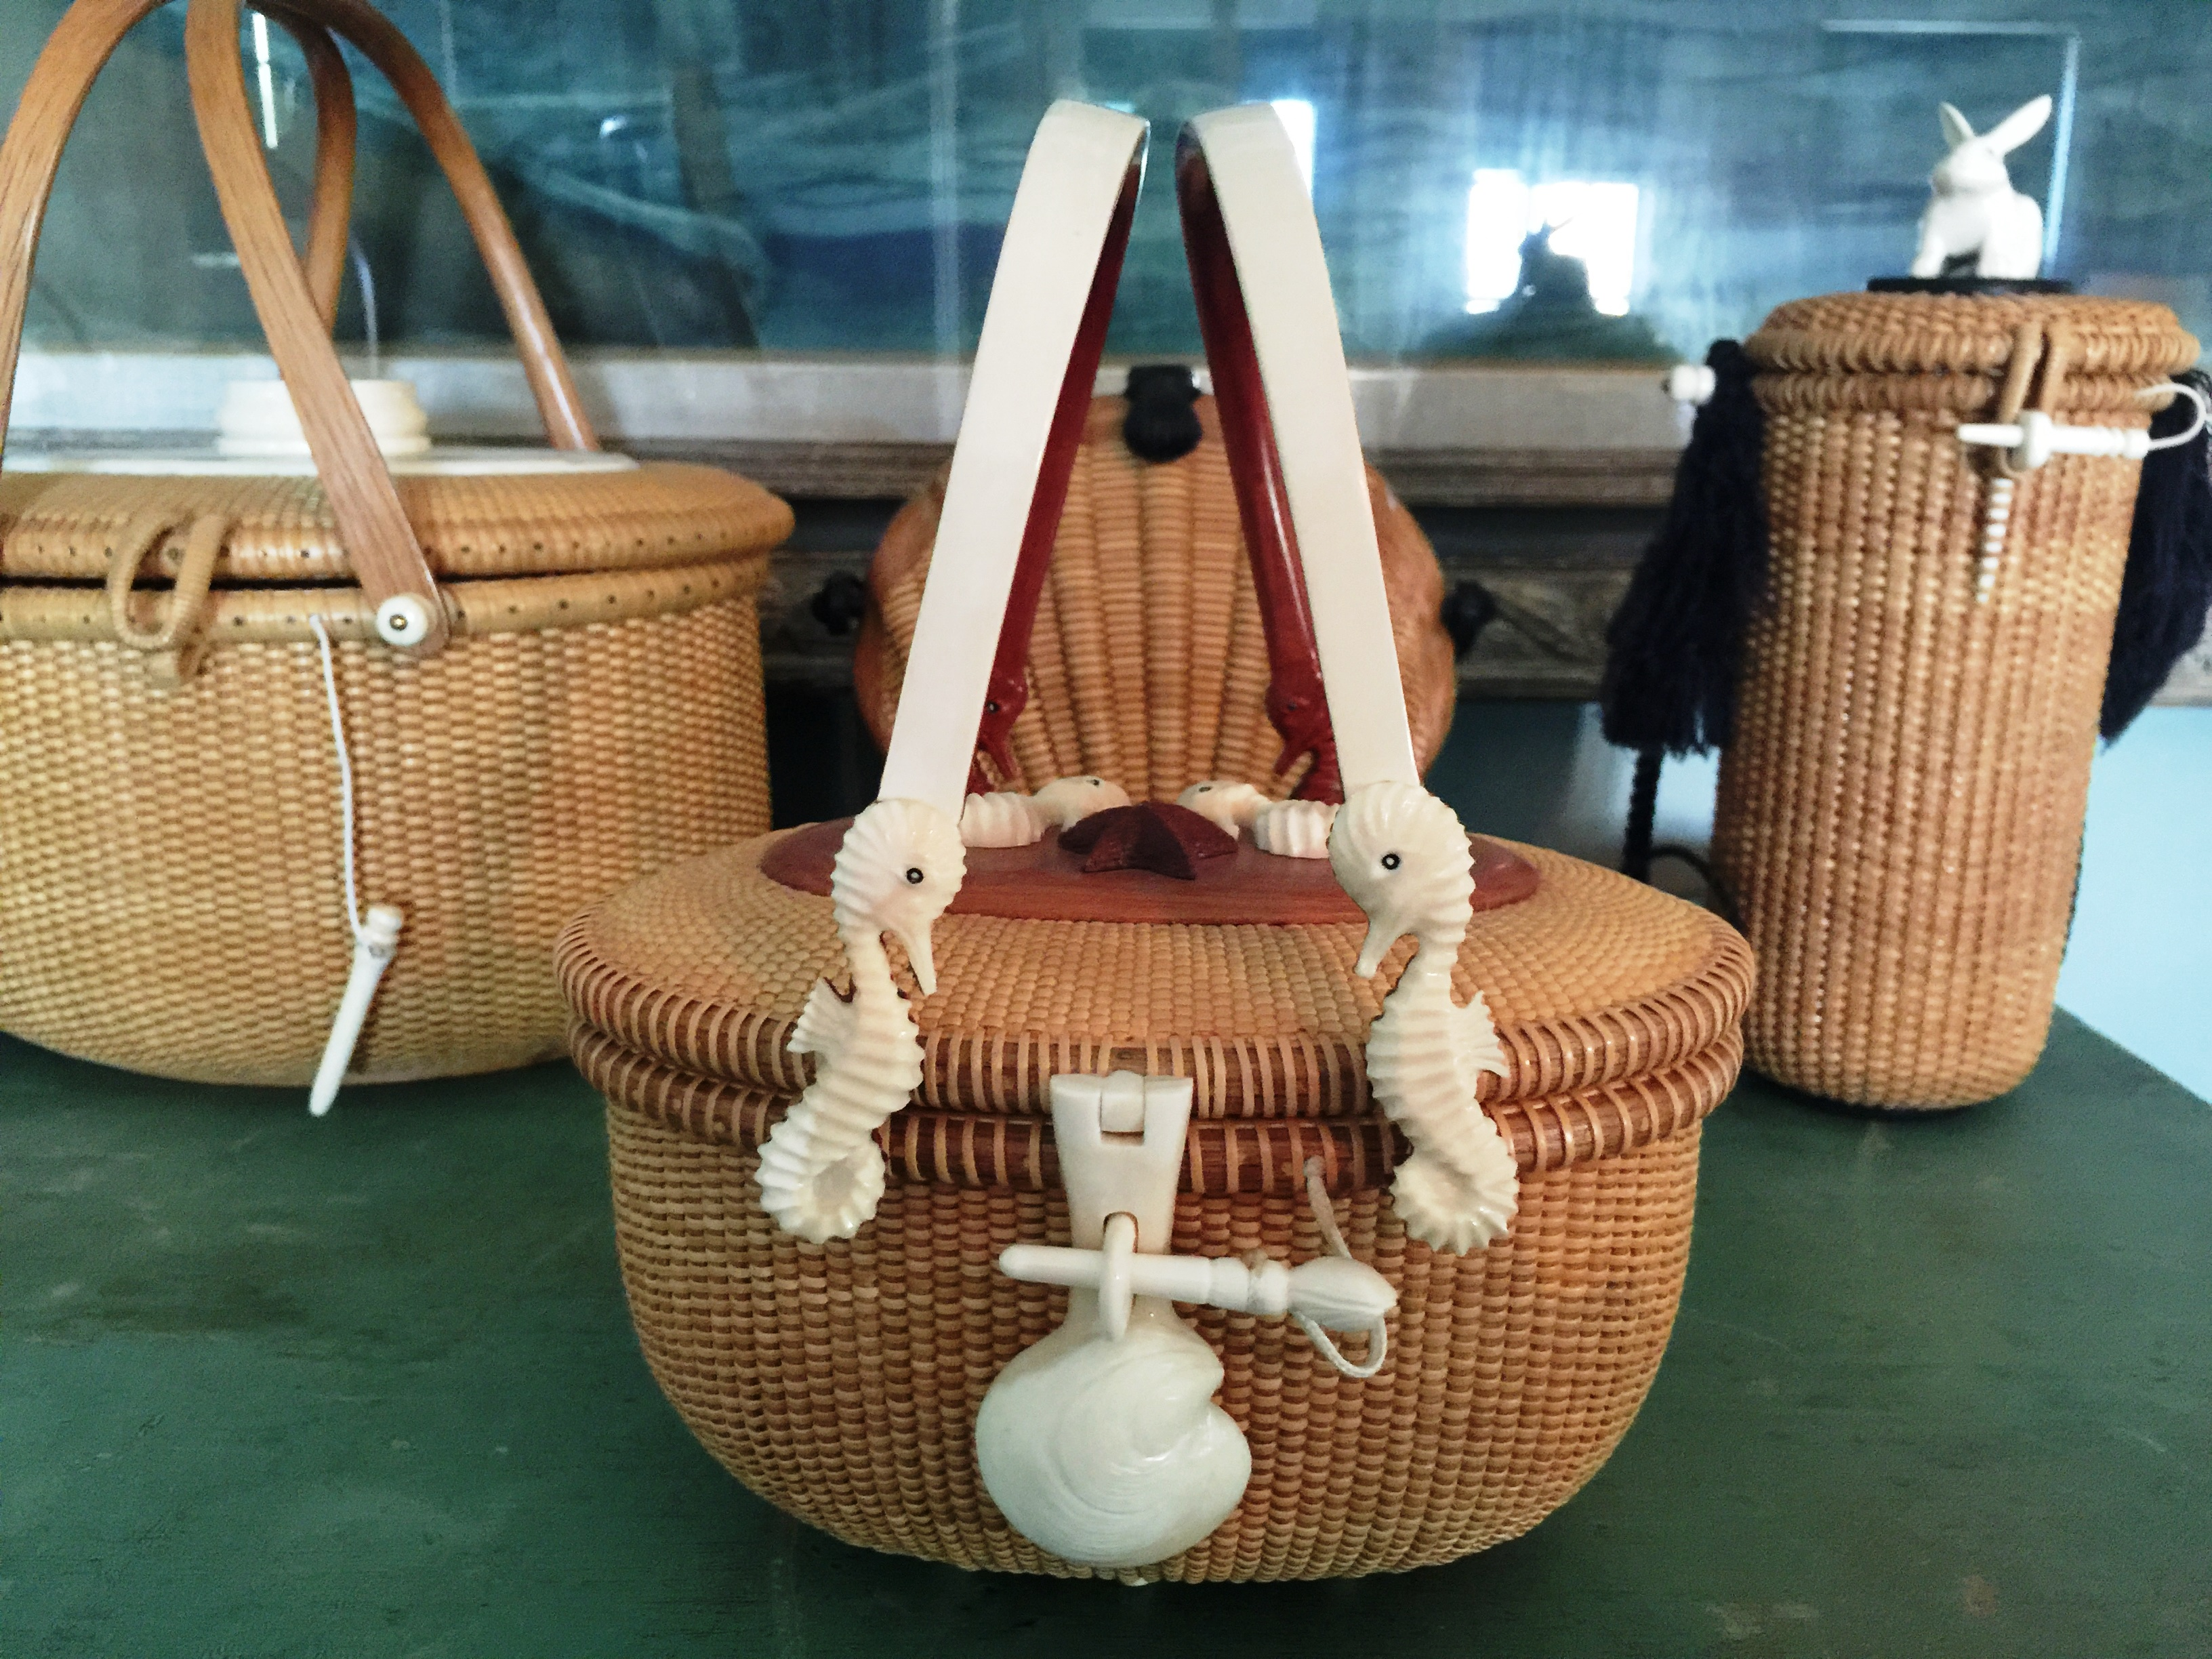 kane-bag-with-seahorse-straps